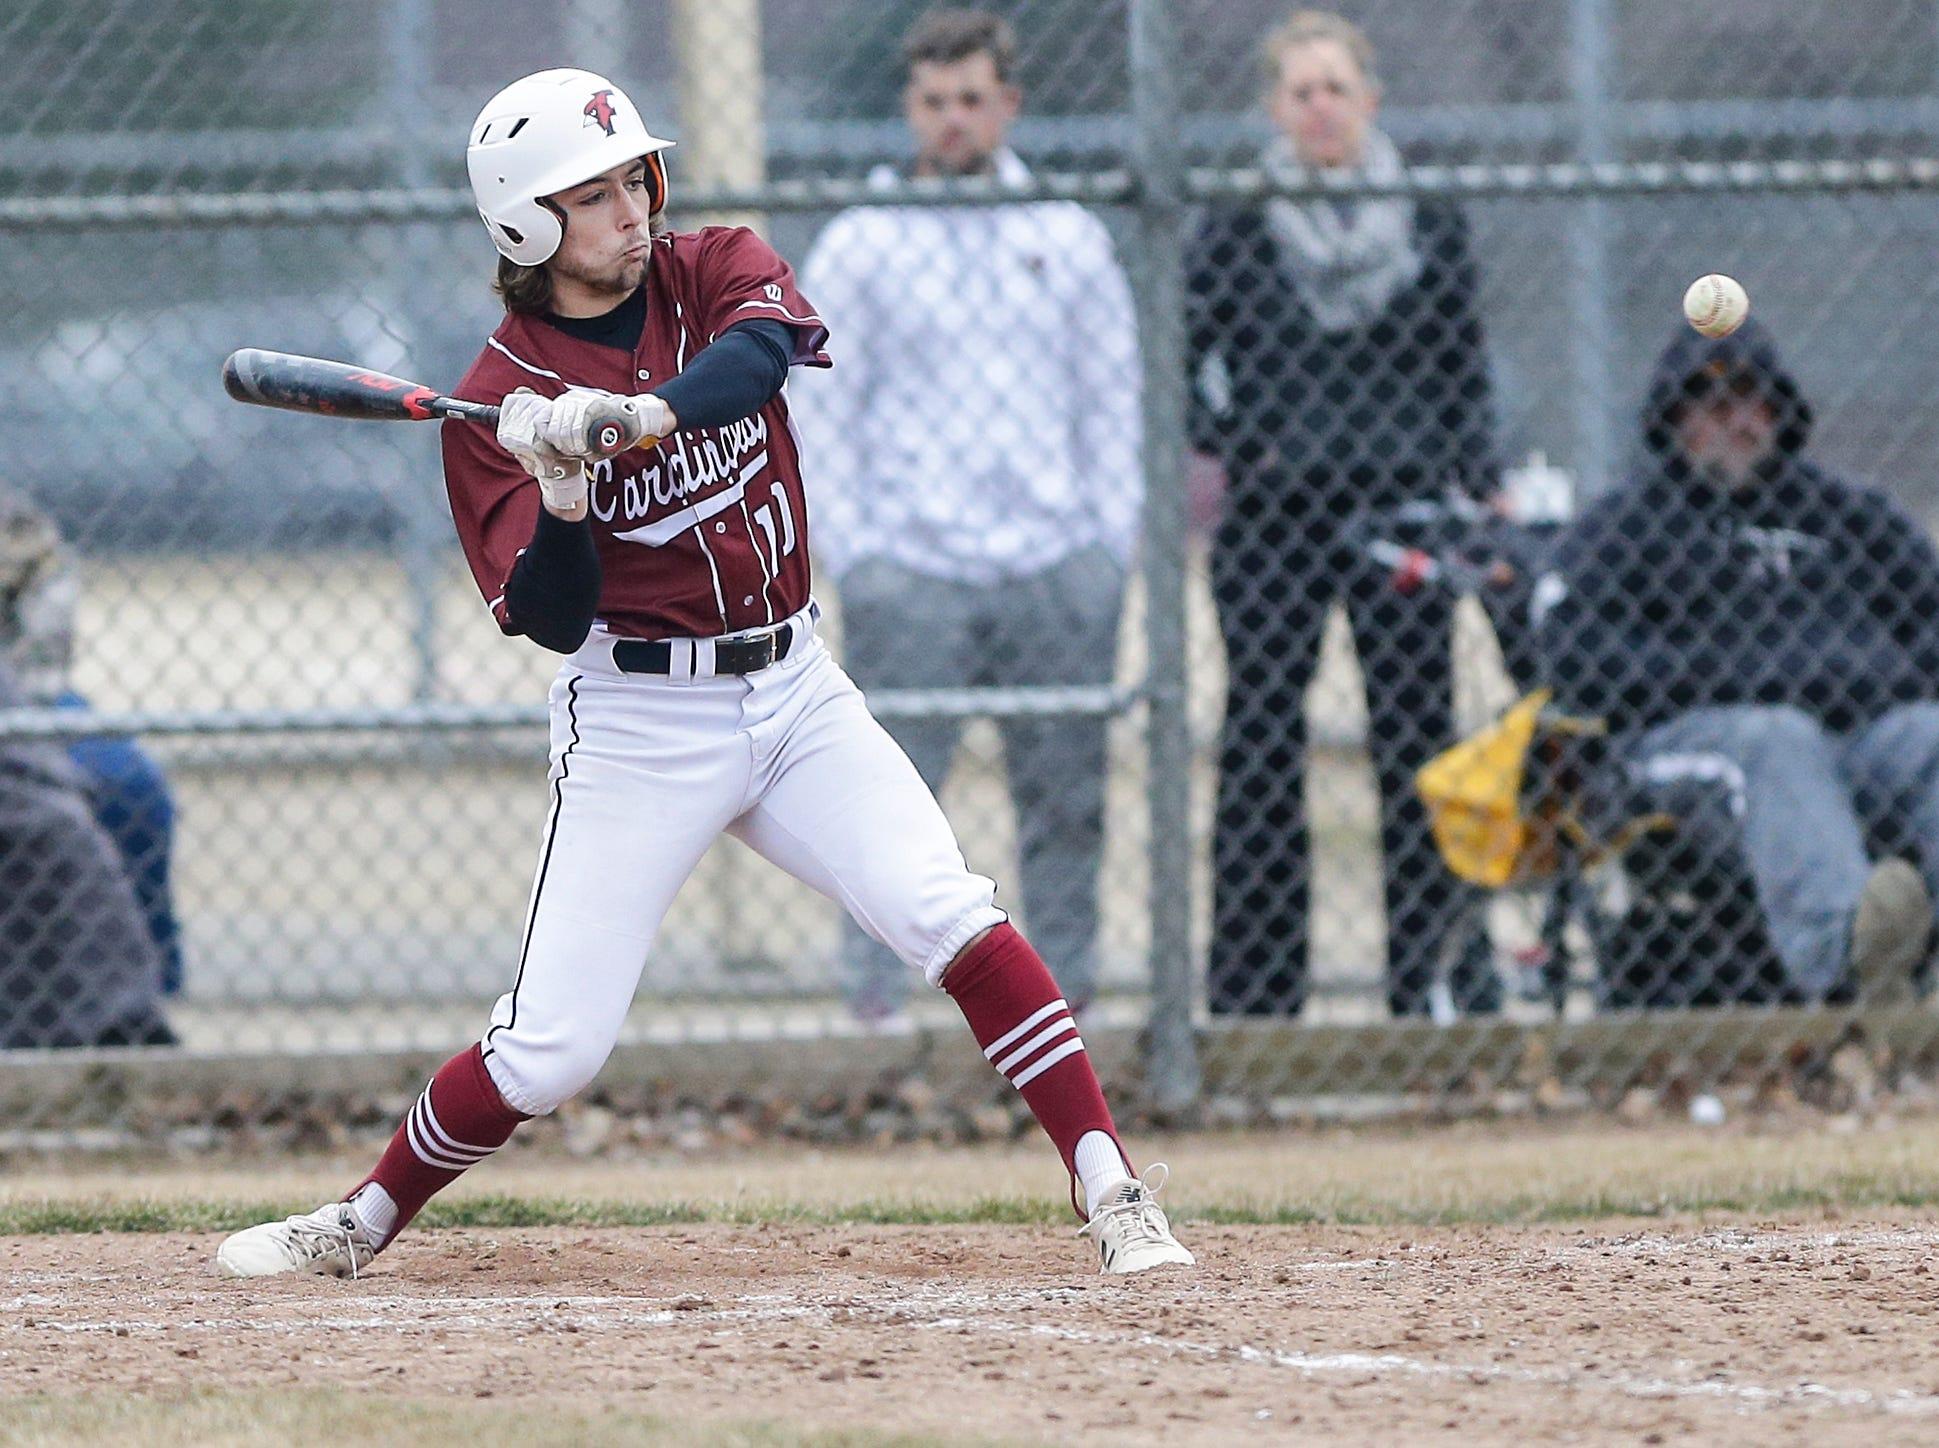 Fond du Lac High School baseball's River Reifsnider hits a single to right field against Ashwaubenon High School Saturday, April 6, 2019 during their game in Fond du Lac, Wis. Fond du Lac won the game 5-3. Doug Raflik/USA TODAY NETWORK-Wisconsin